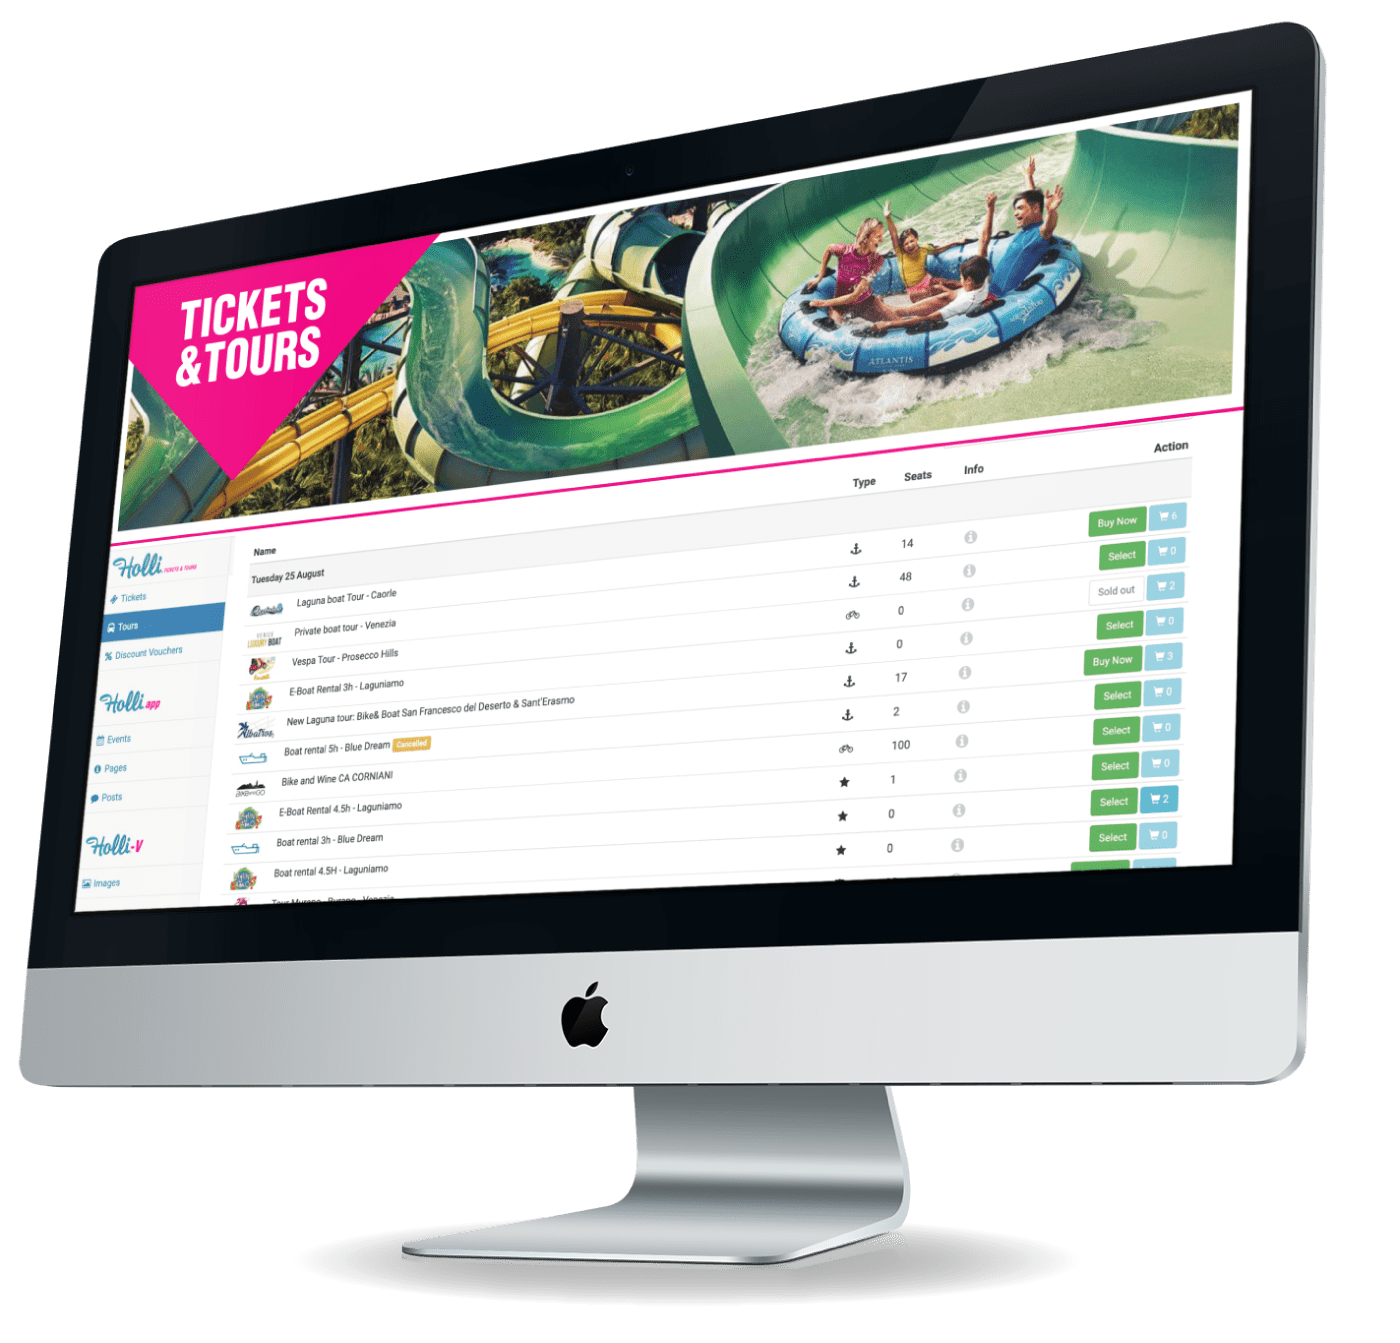 Tickets & Tours dashboard screen on an iMac